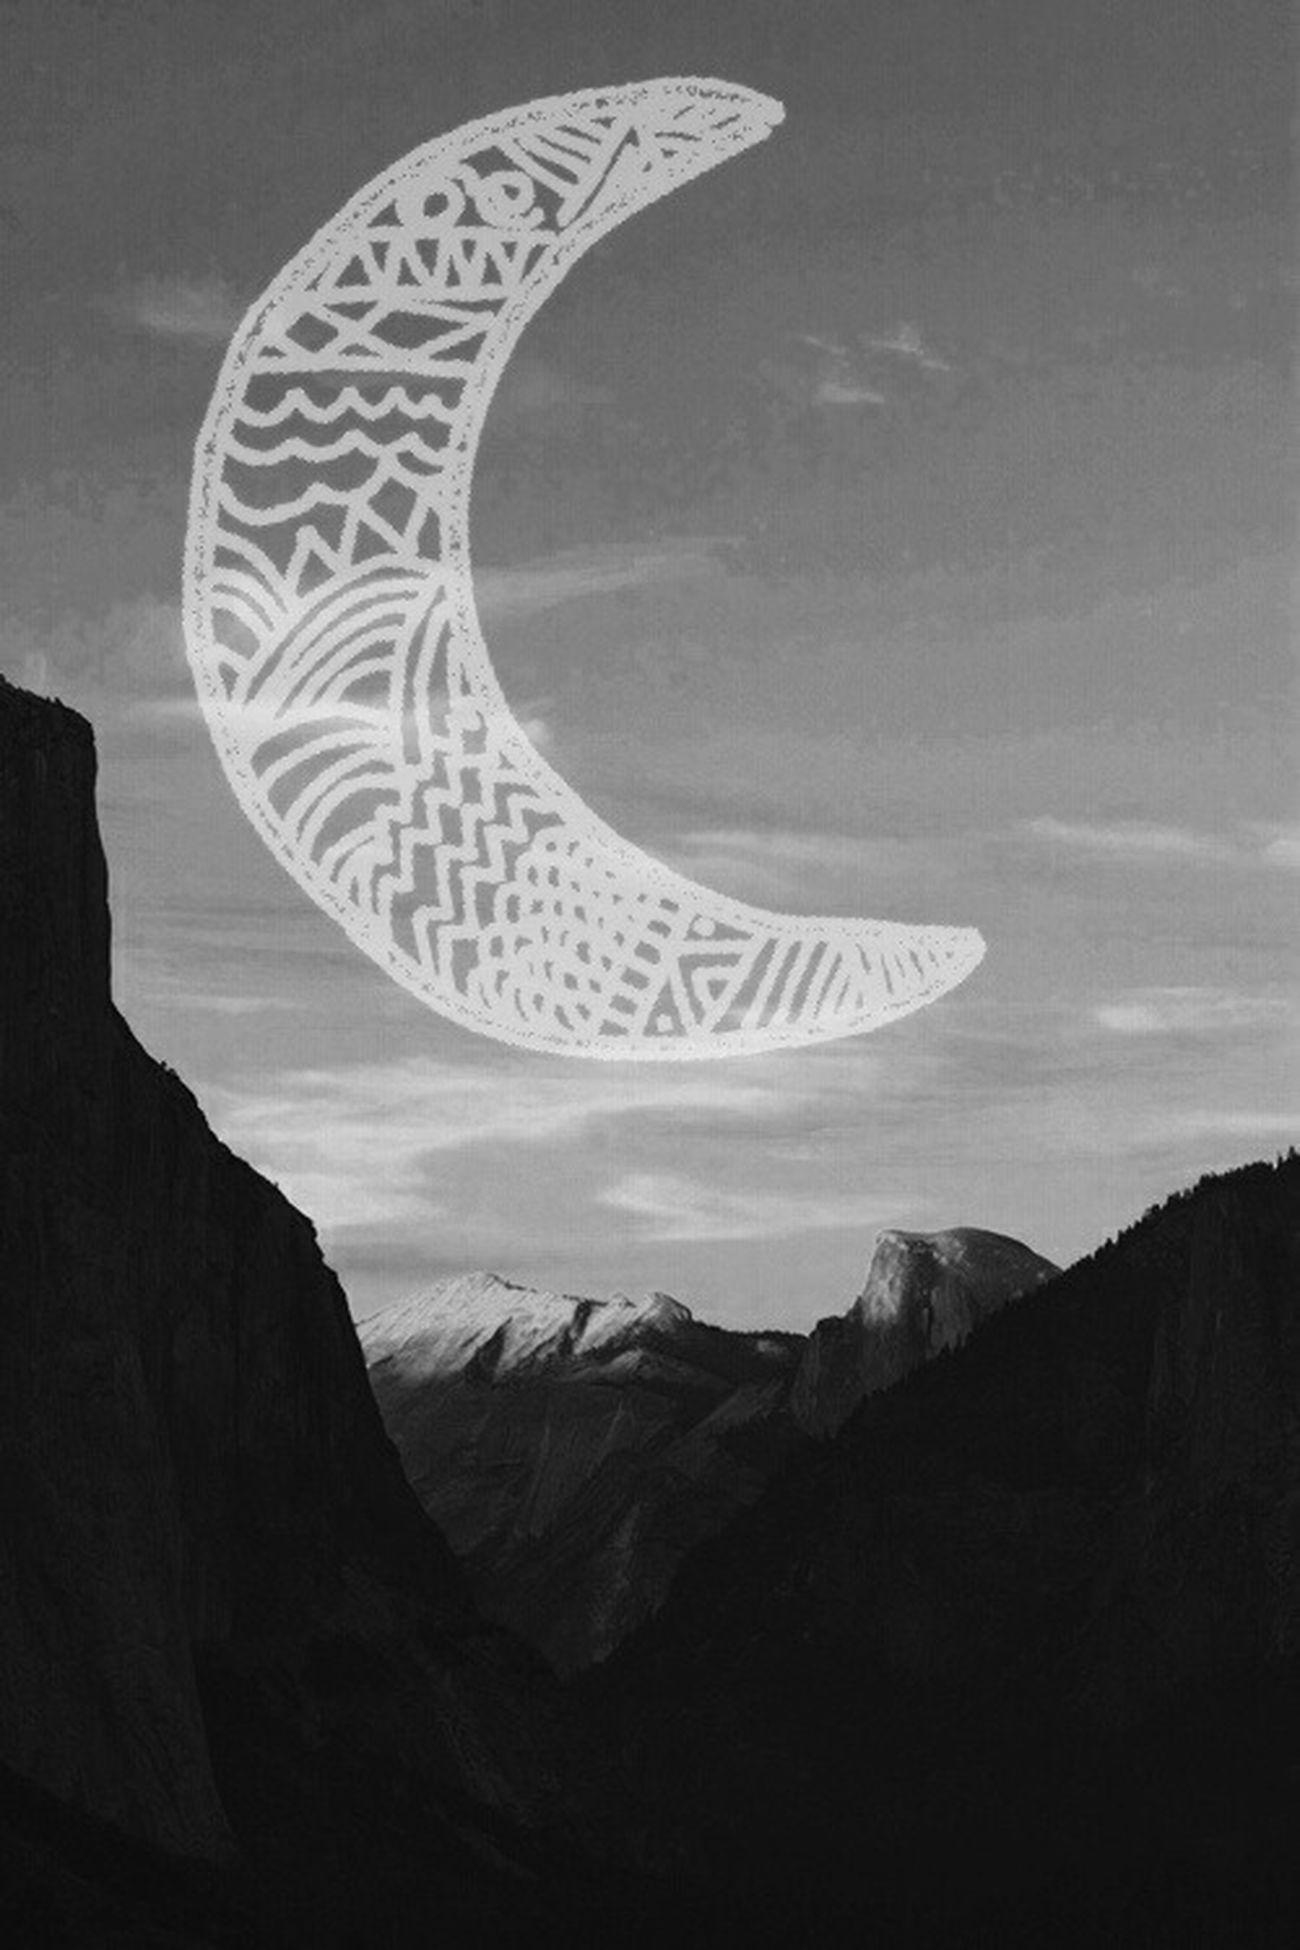 Moon Tribal Art Dre▲m